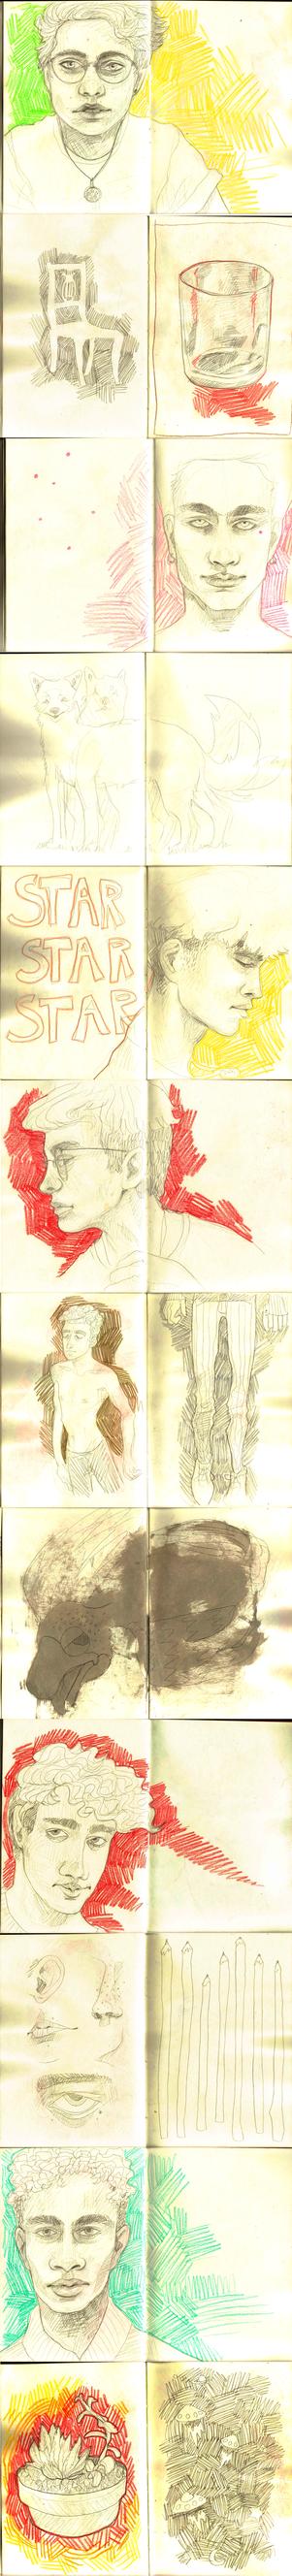 Sketch Dump 5 by wick-y